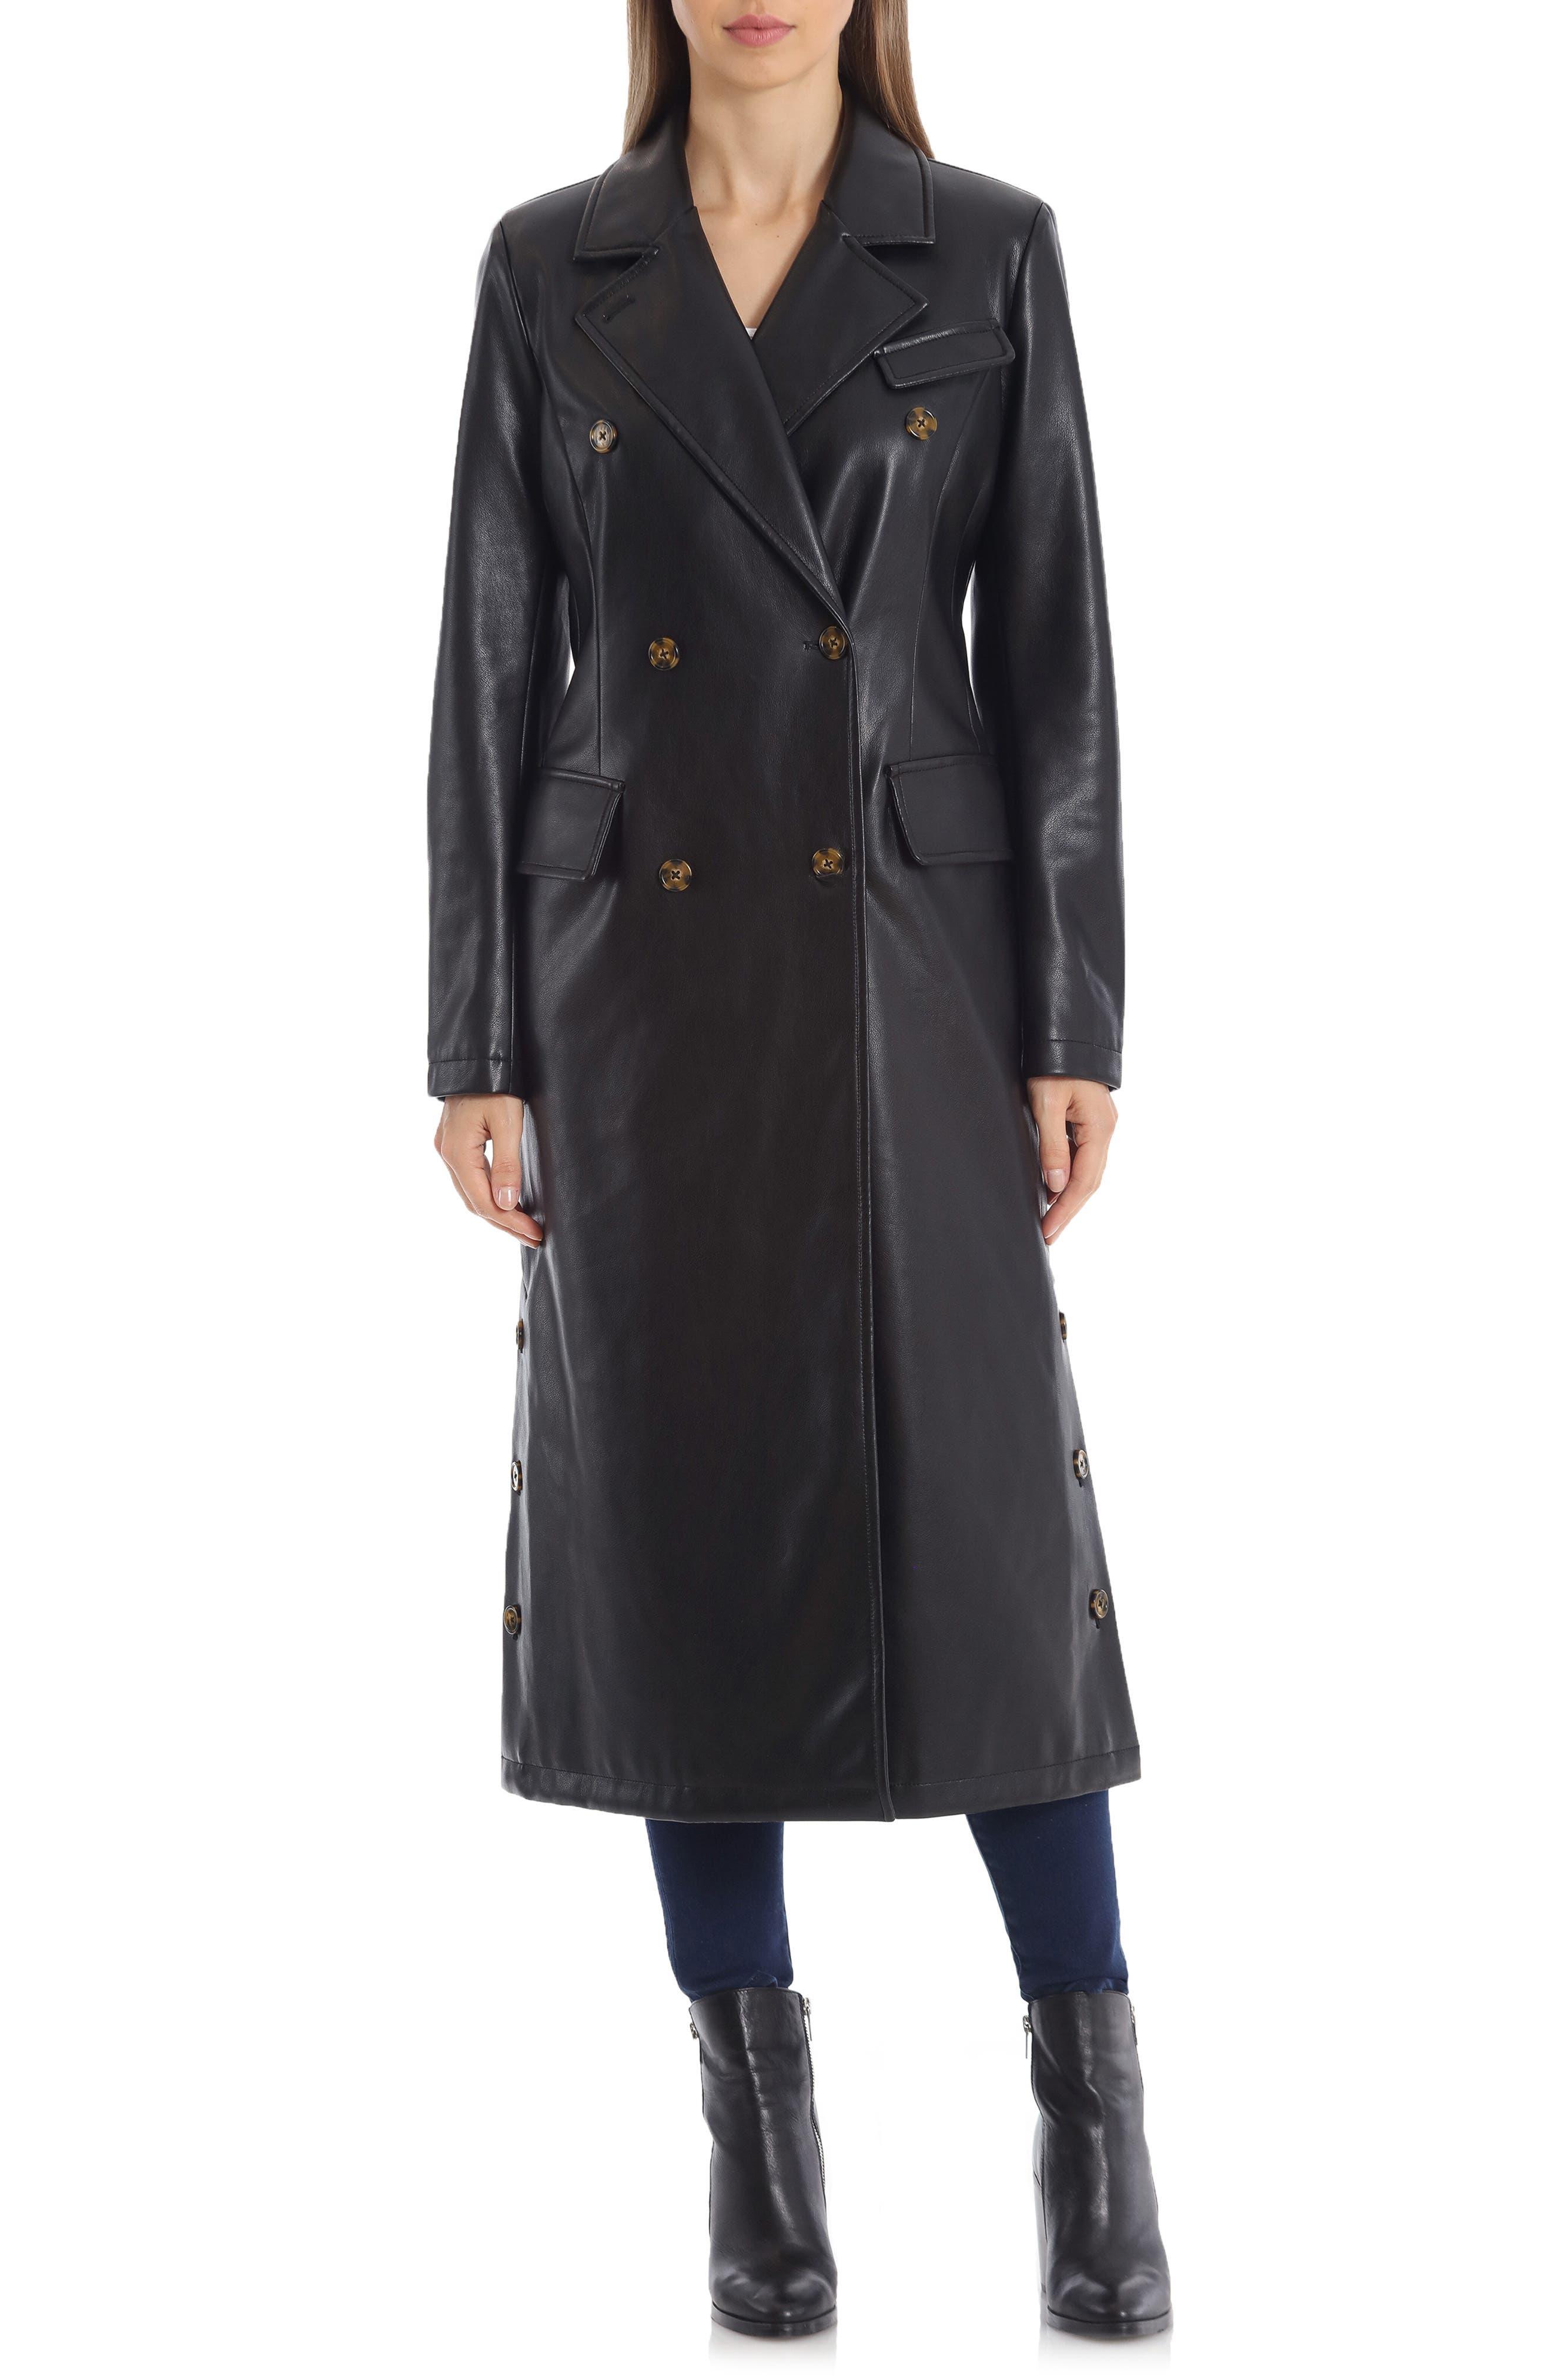 70s Jackets, Furs, Vests, Ponchos Womens Avec Les Filles Double Breasted Faux Leather Trench Coat Size Medium - Black $179.00 AT vintagedancer.com